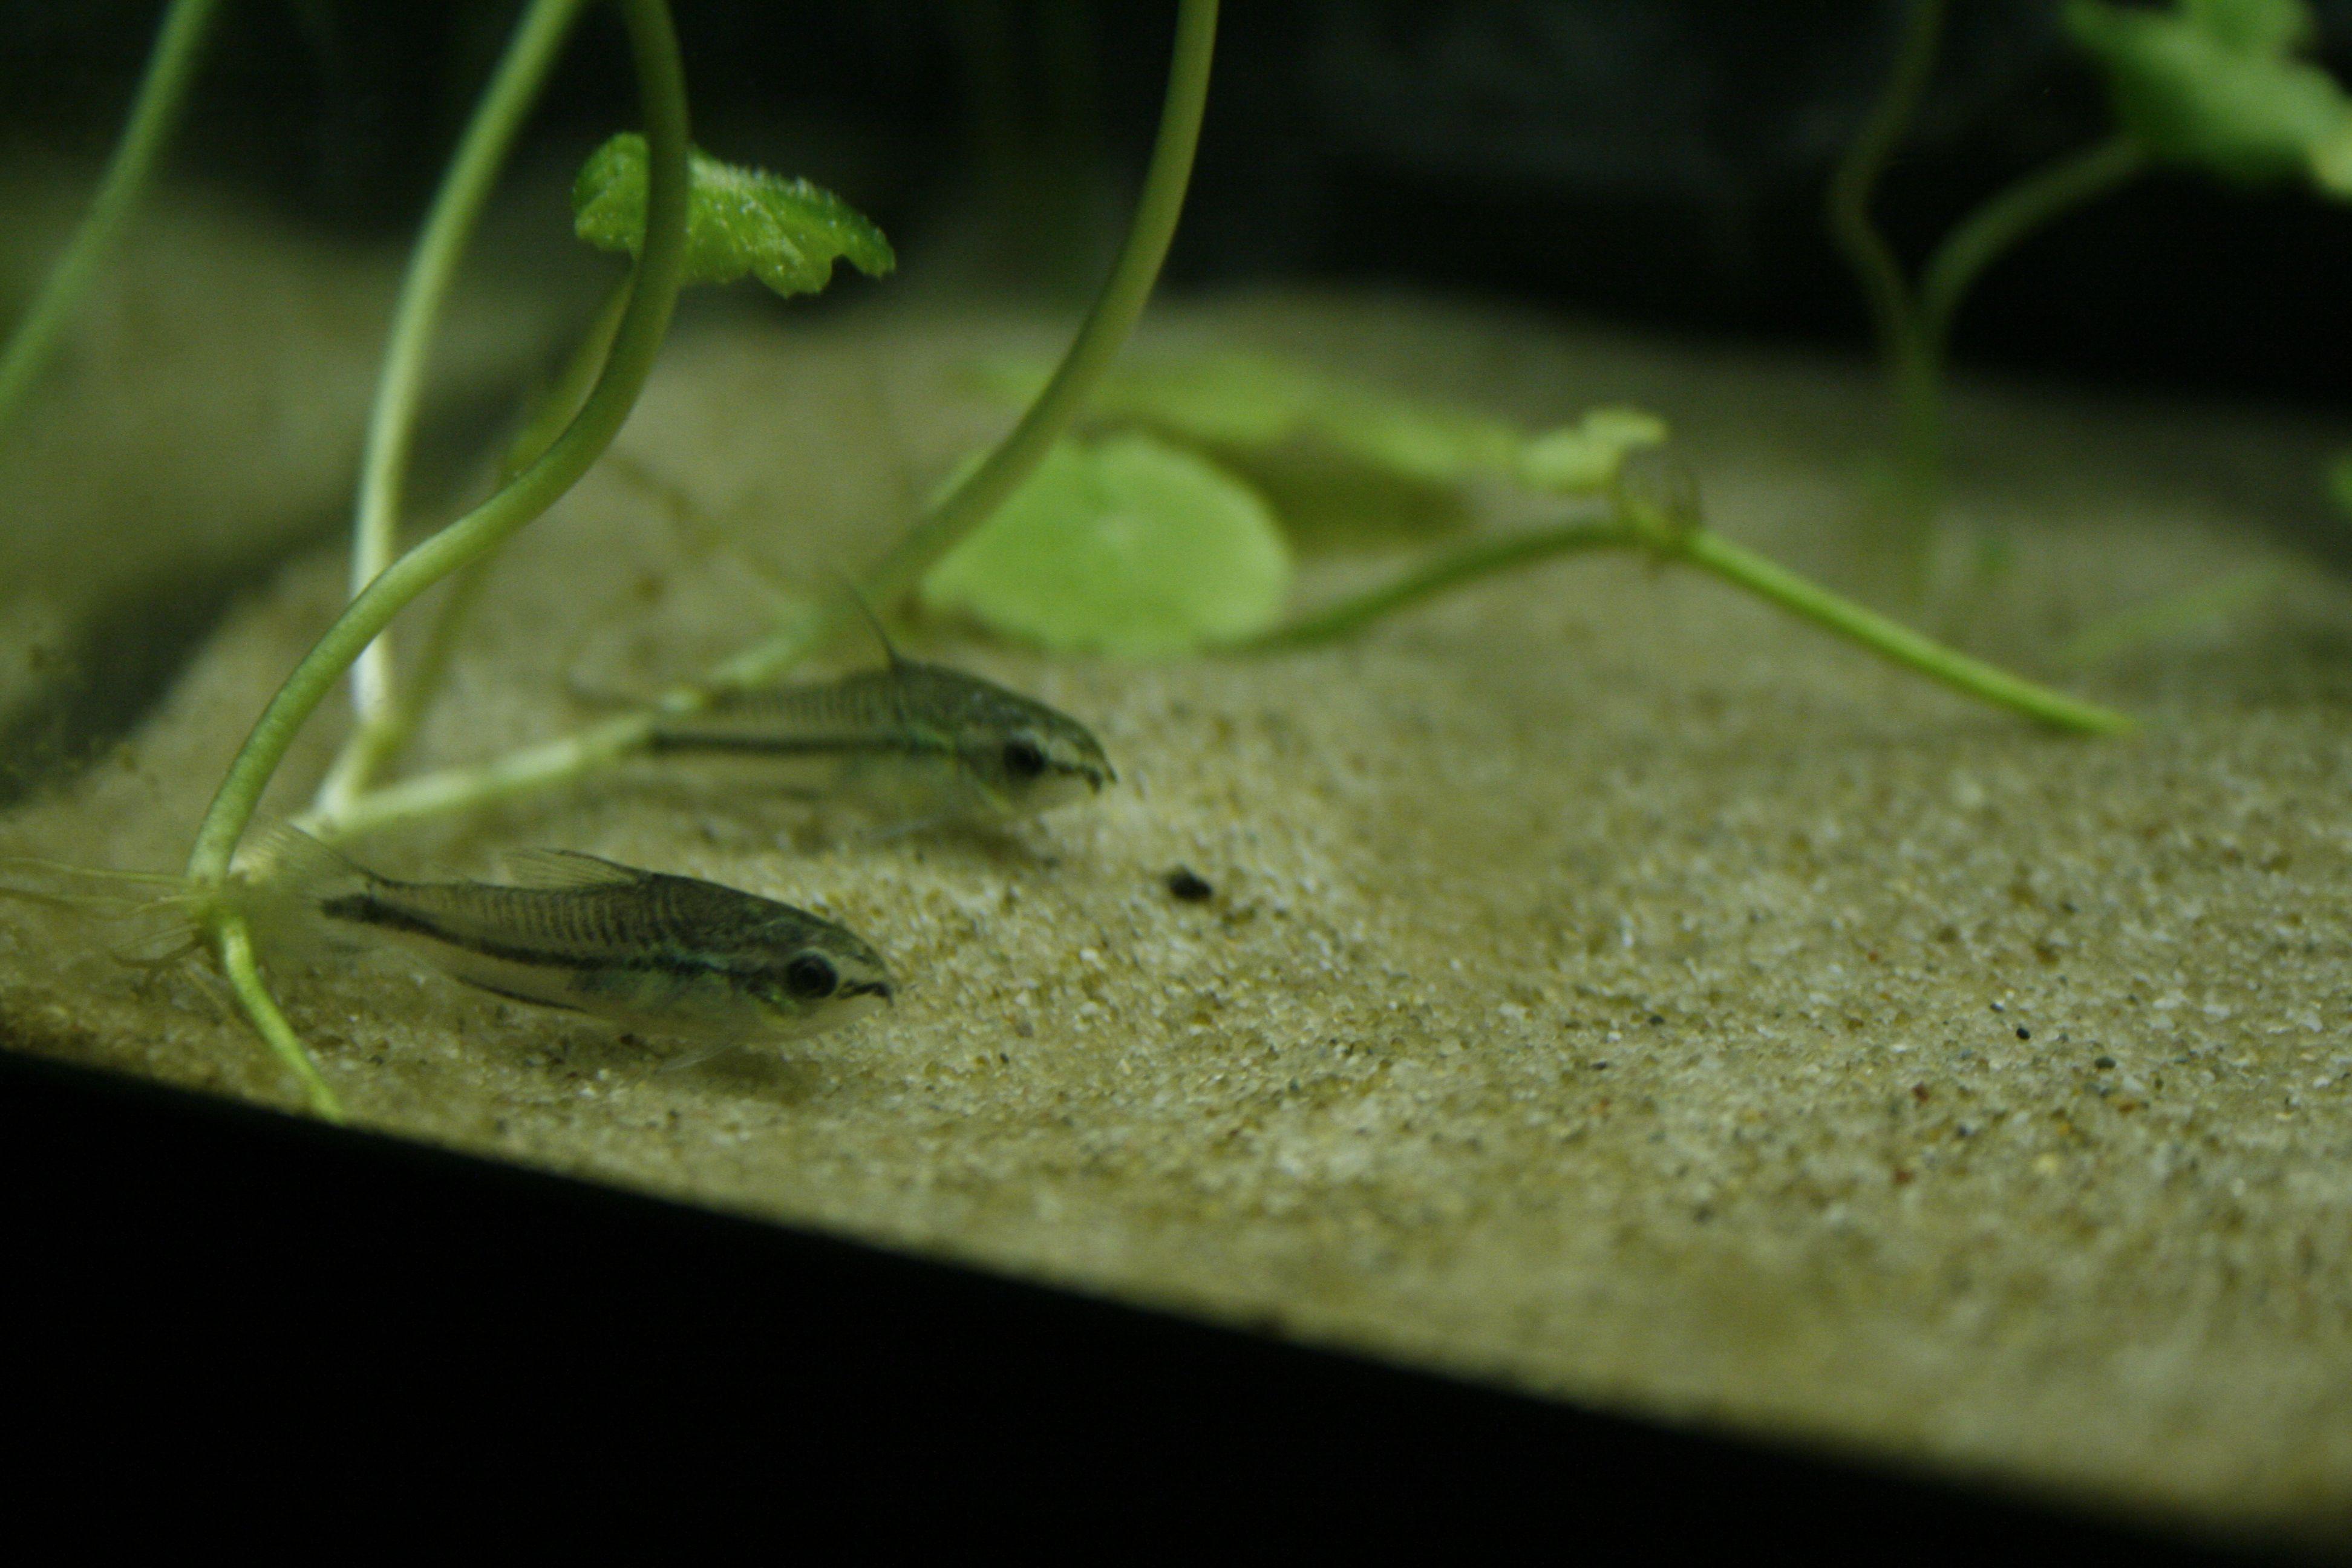 Caresheet Pygmy Cory Corydoras Pygmaeus Hastatus Habrosus Red Cherry Shrimp Fish Cherry Shrimp